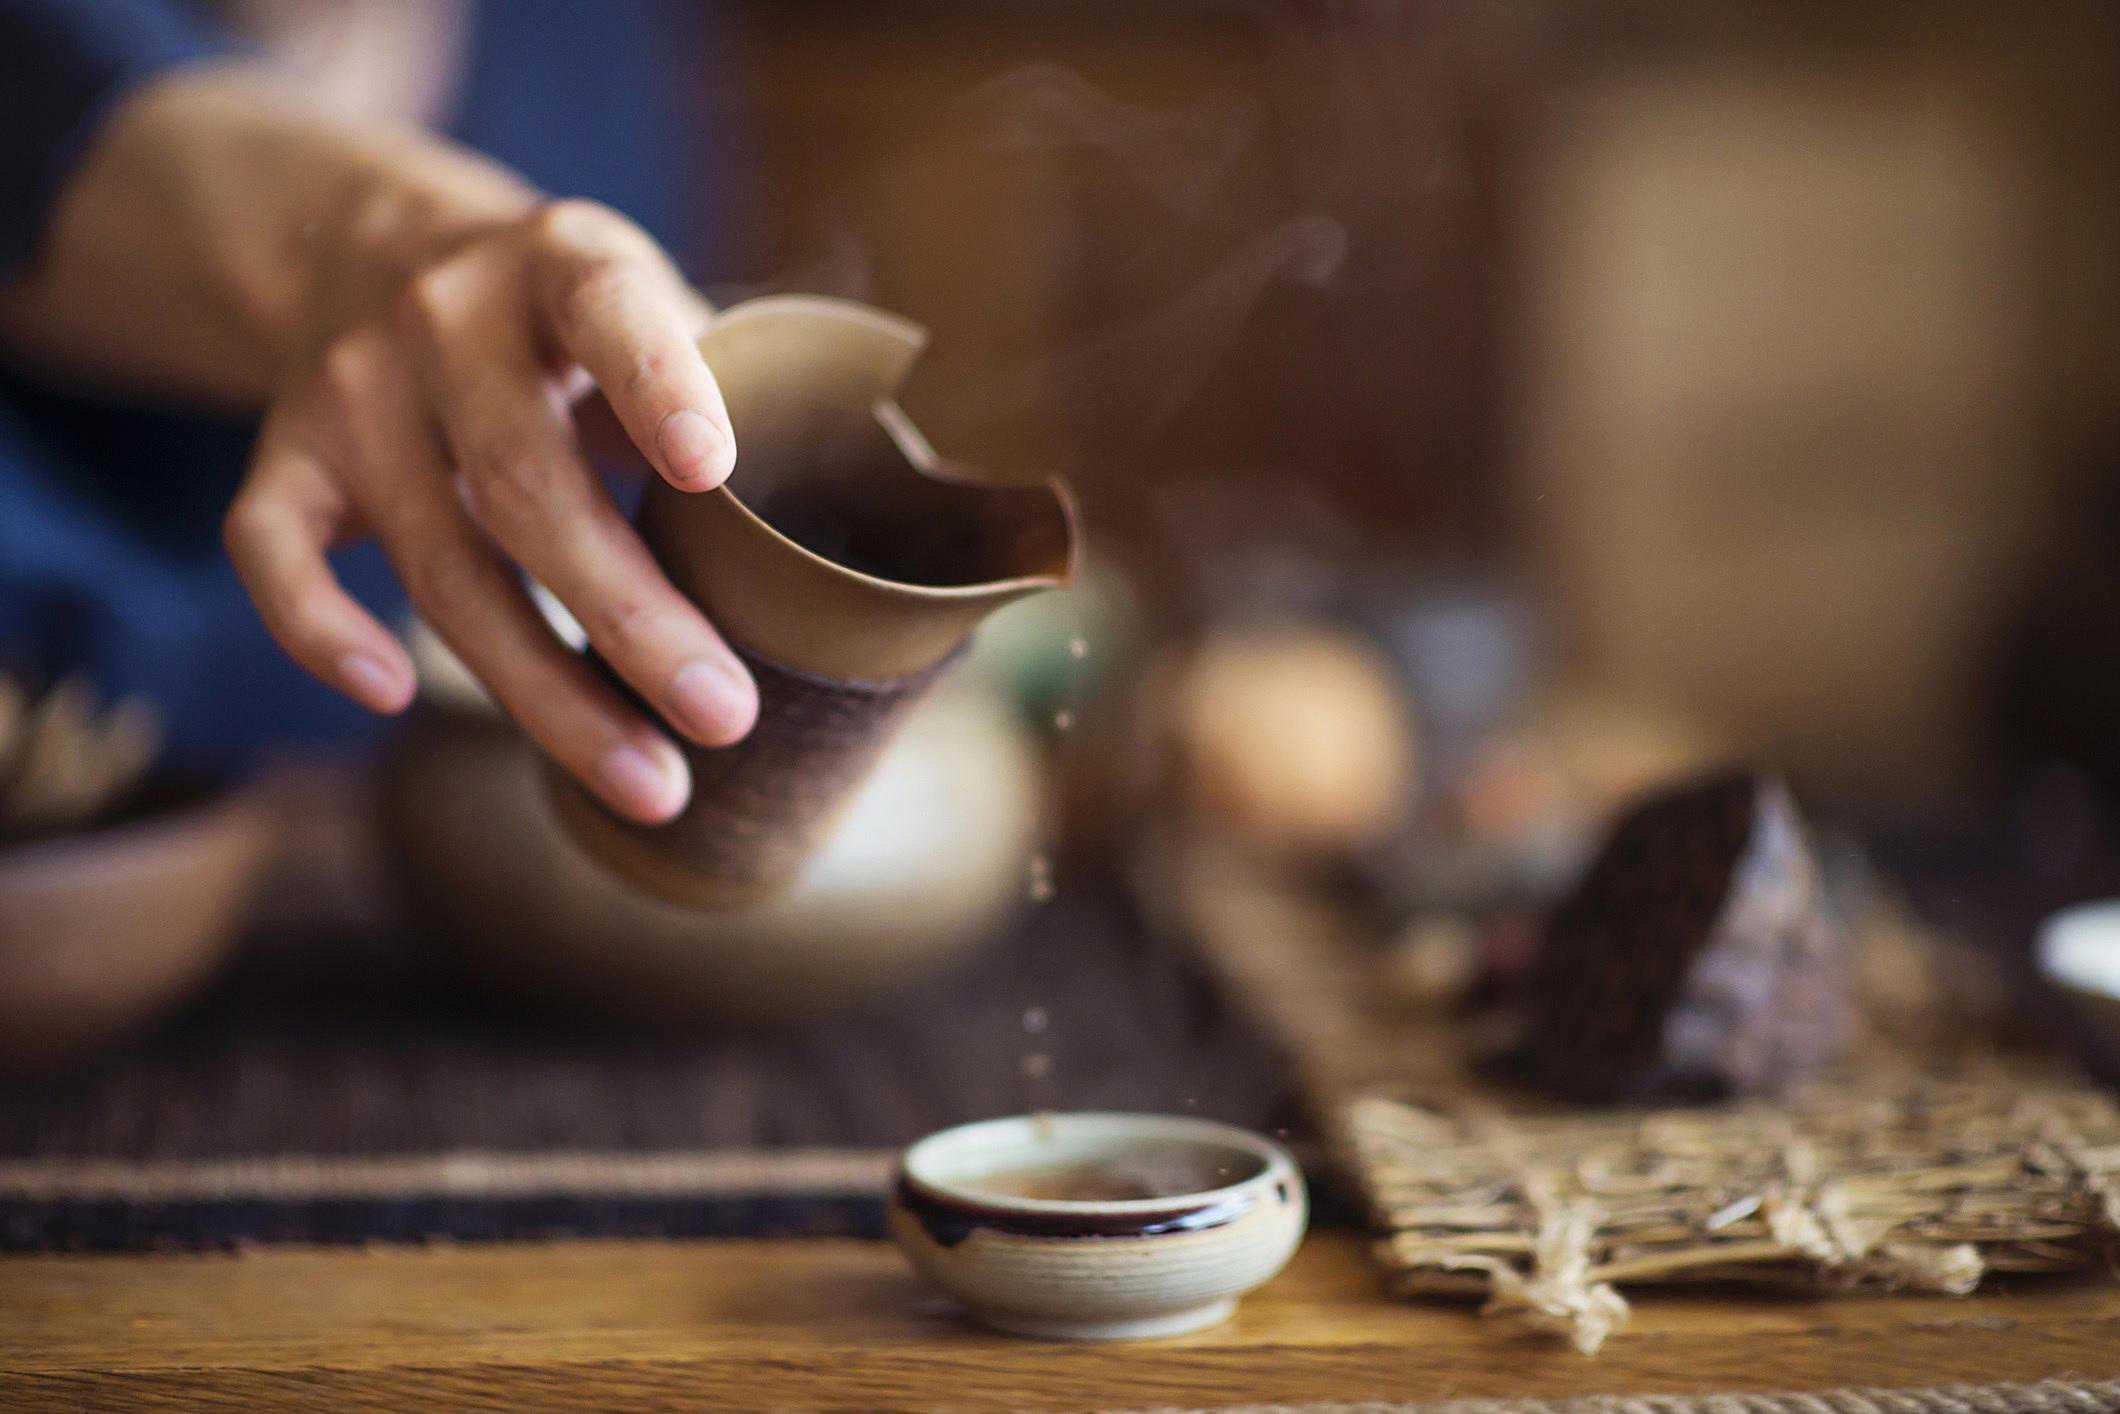 Serving Chinese tea into ceramic tea cups